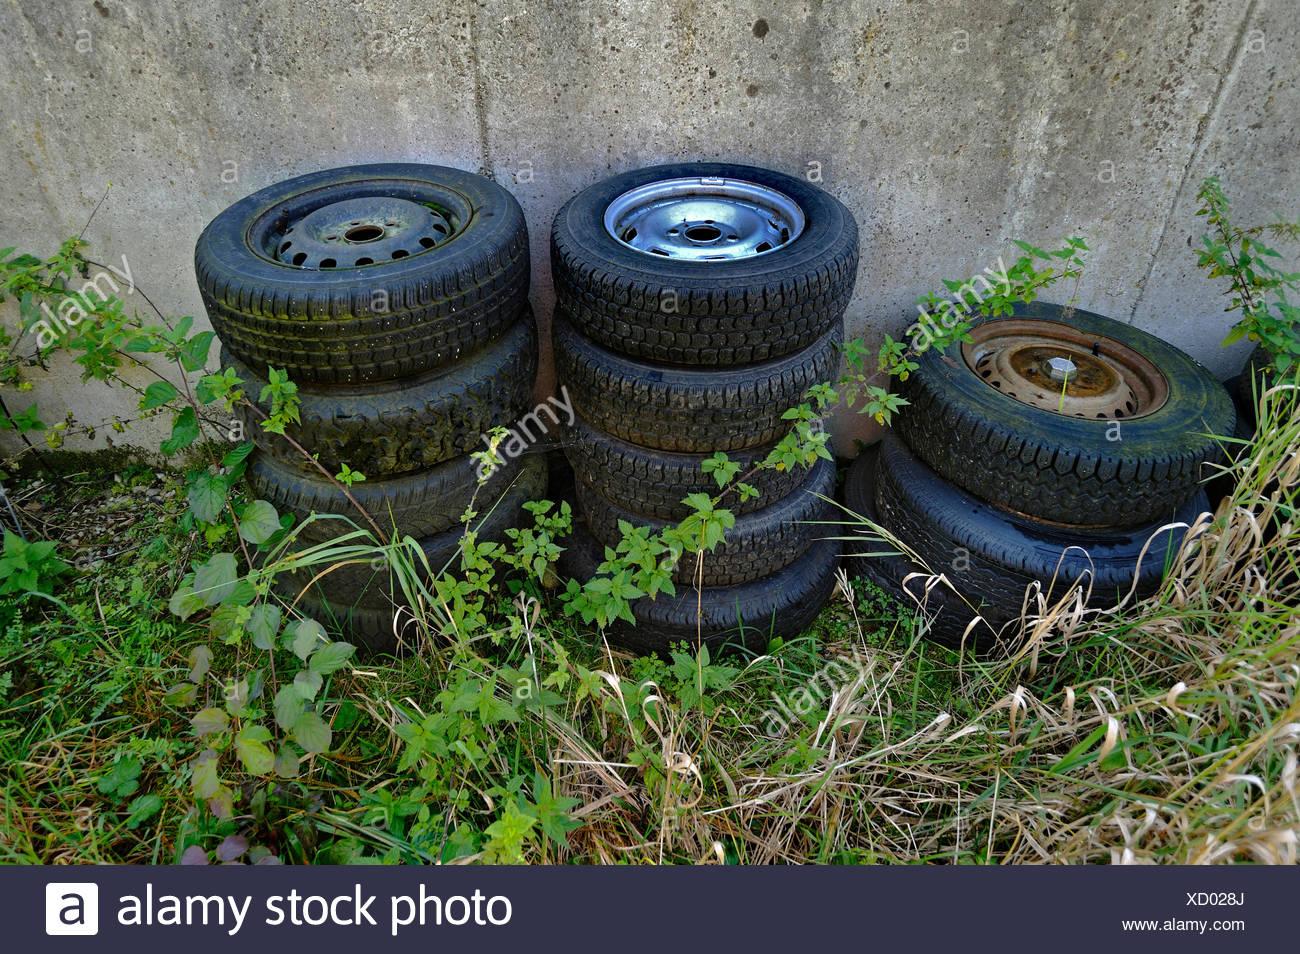 Old car tires between nettles, Schaeftlarn, Bavaria - Stock Image